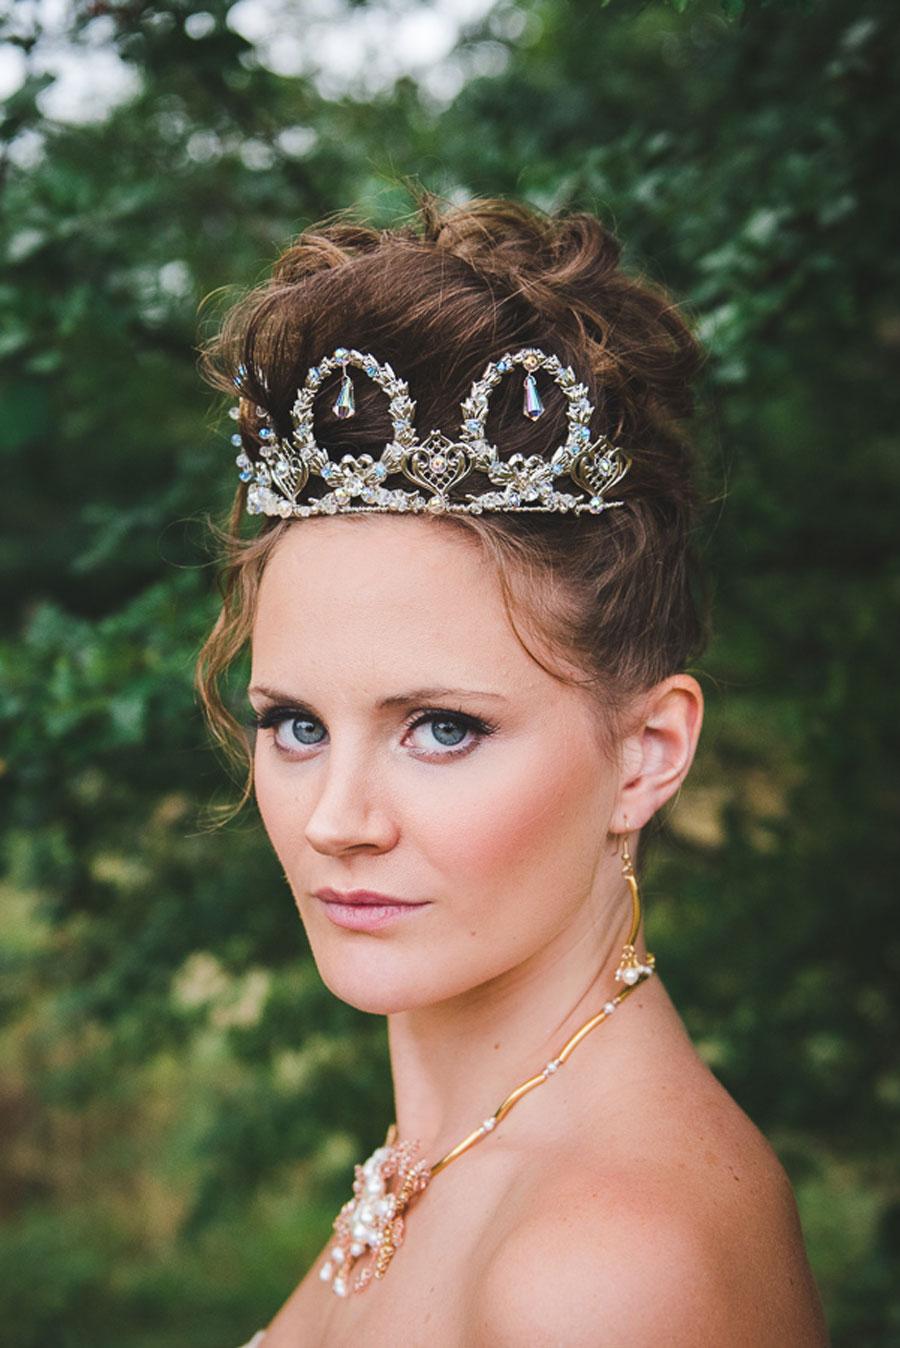 A Late Summer Renaissance-Meets-Fantasy Themed Bridal Shoot0051